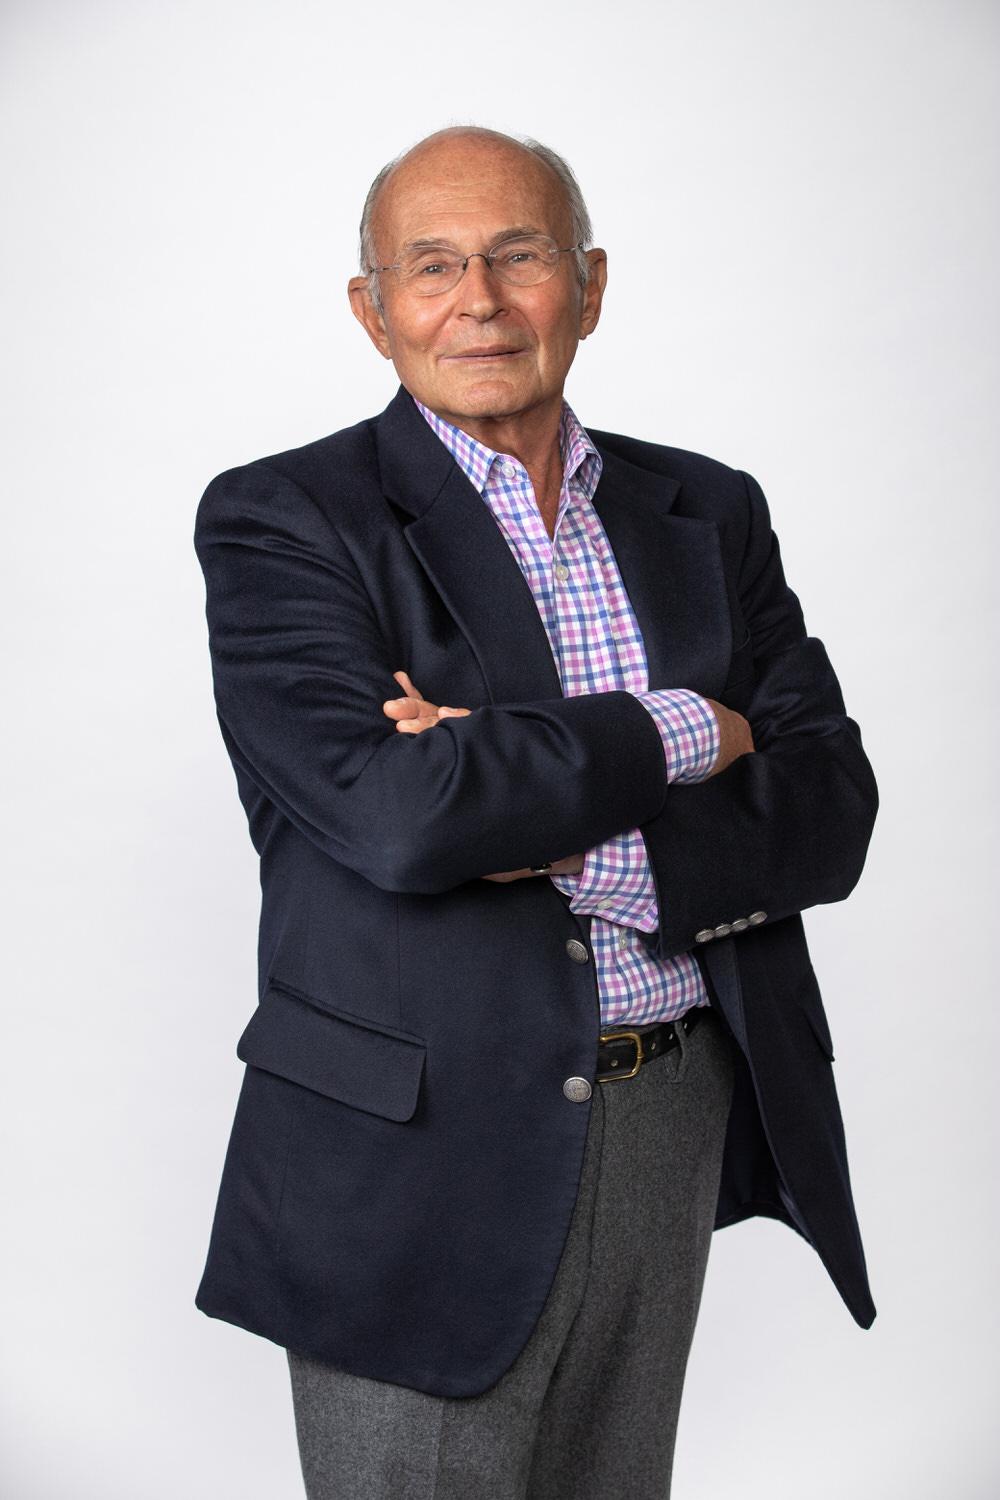 John Marth, Founder of Marymont Group